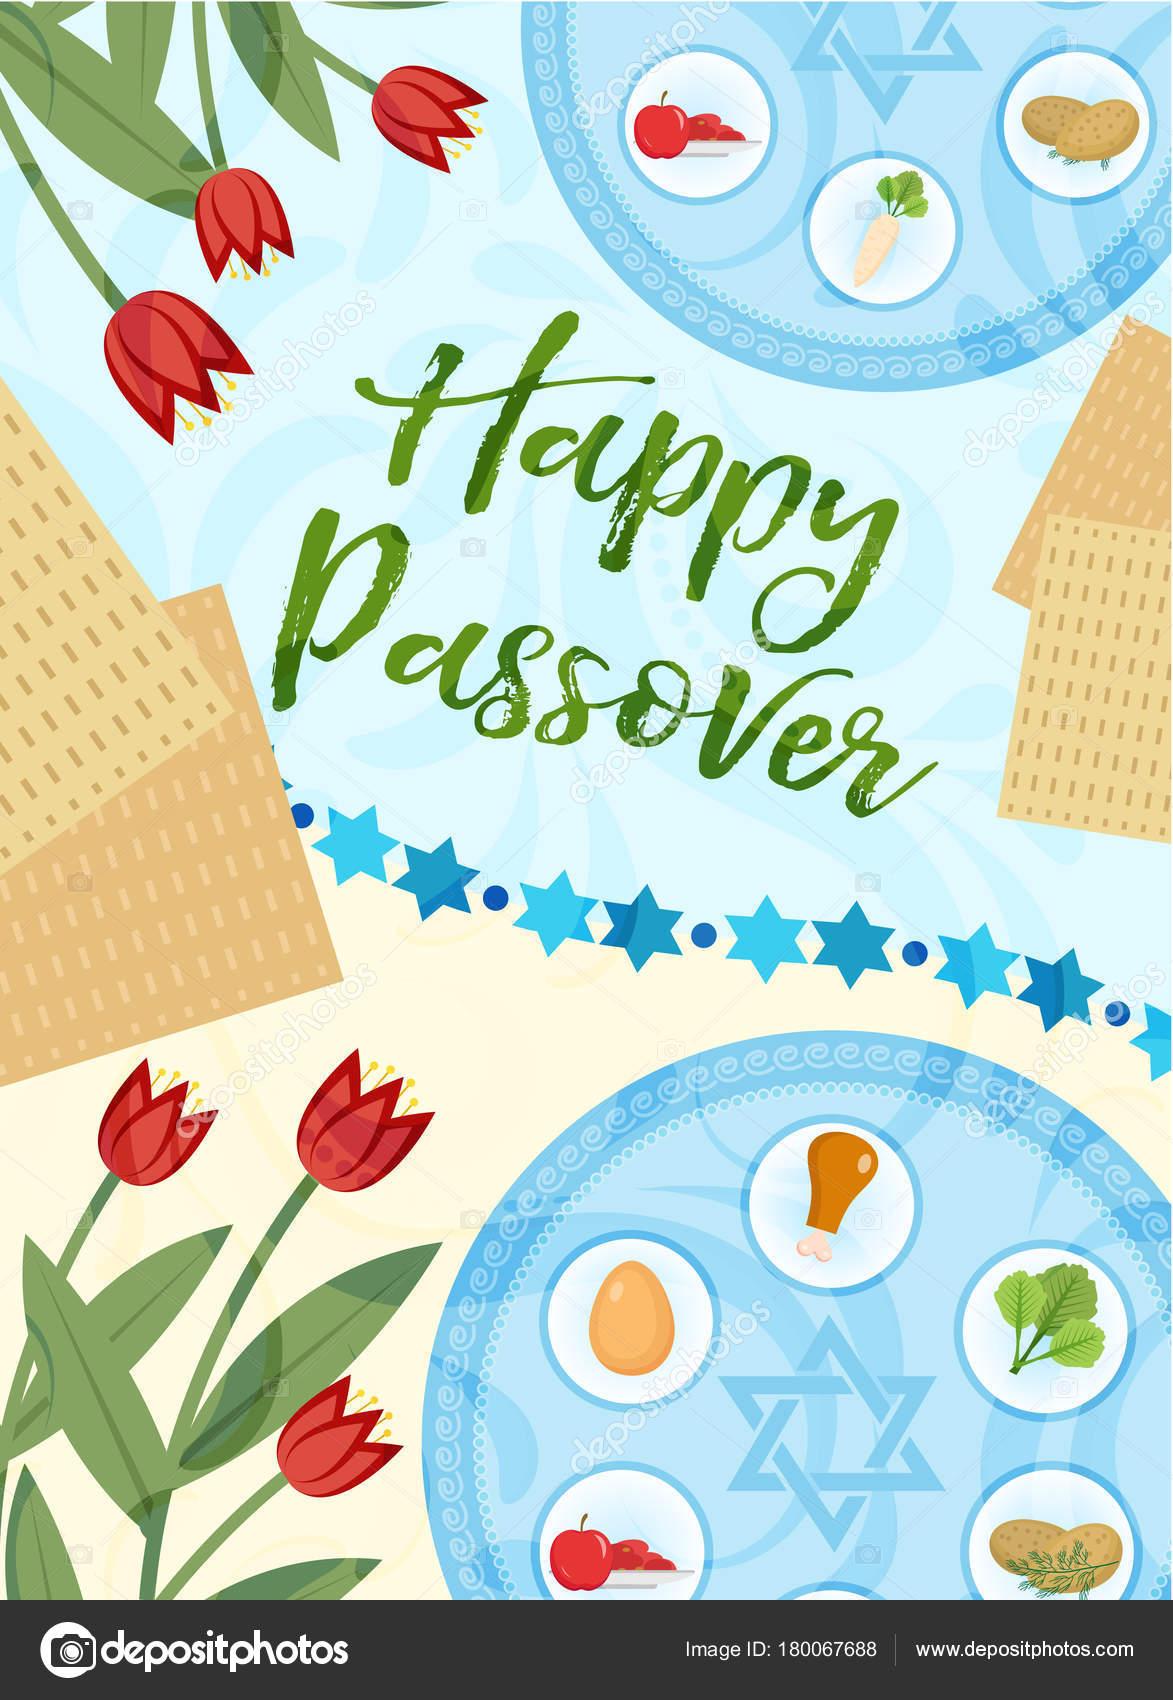 Passover poster invitation flyer greeting card pesach template passover poster invitation flyer greeting card pesach template for your design with m4hsunfo